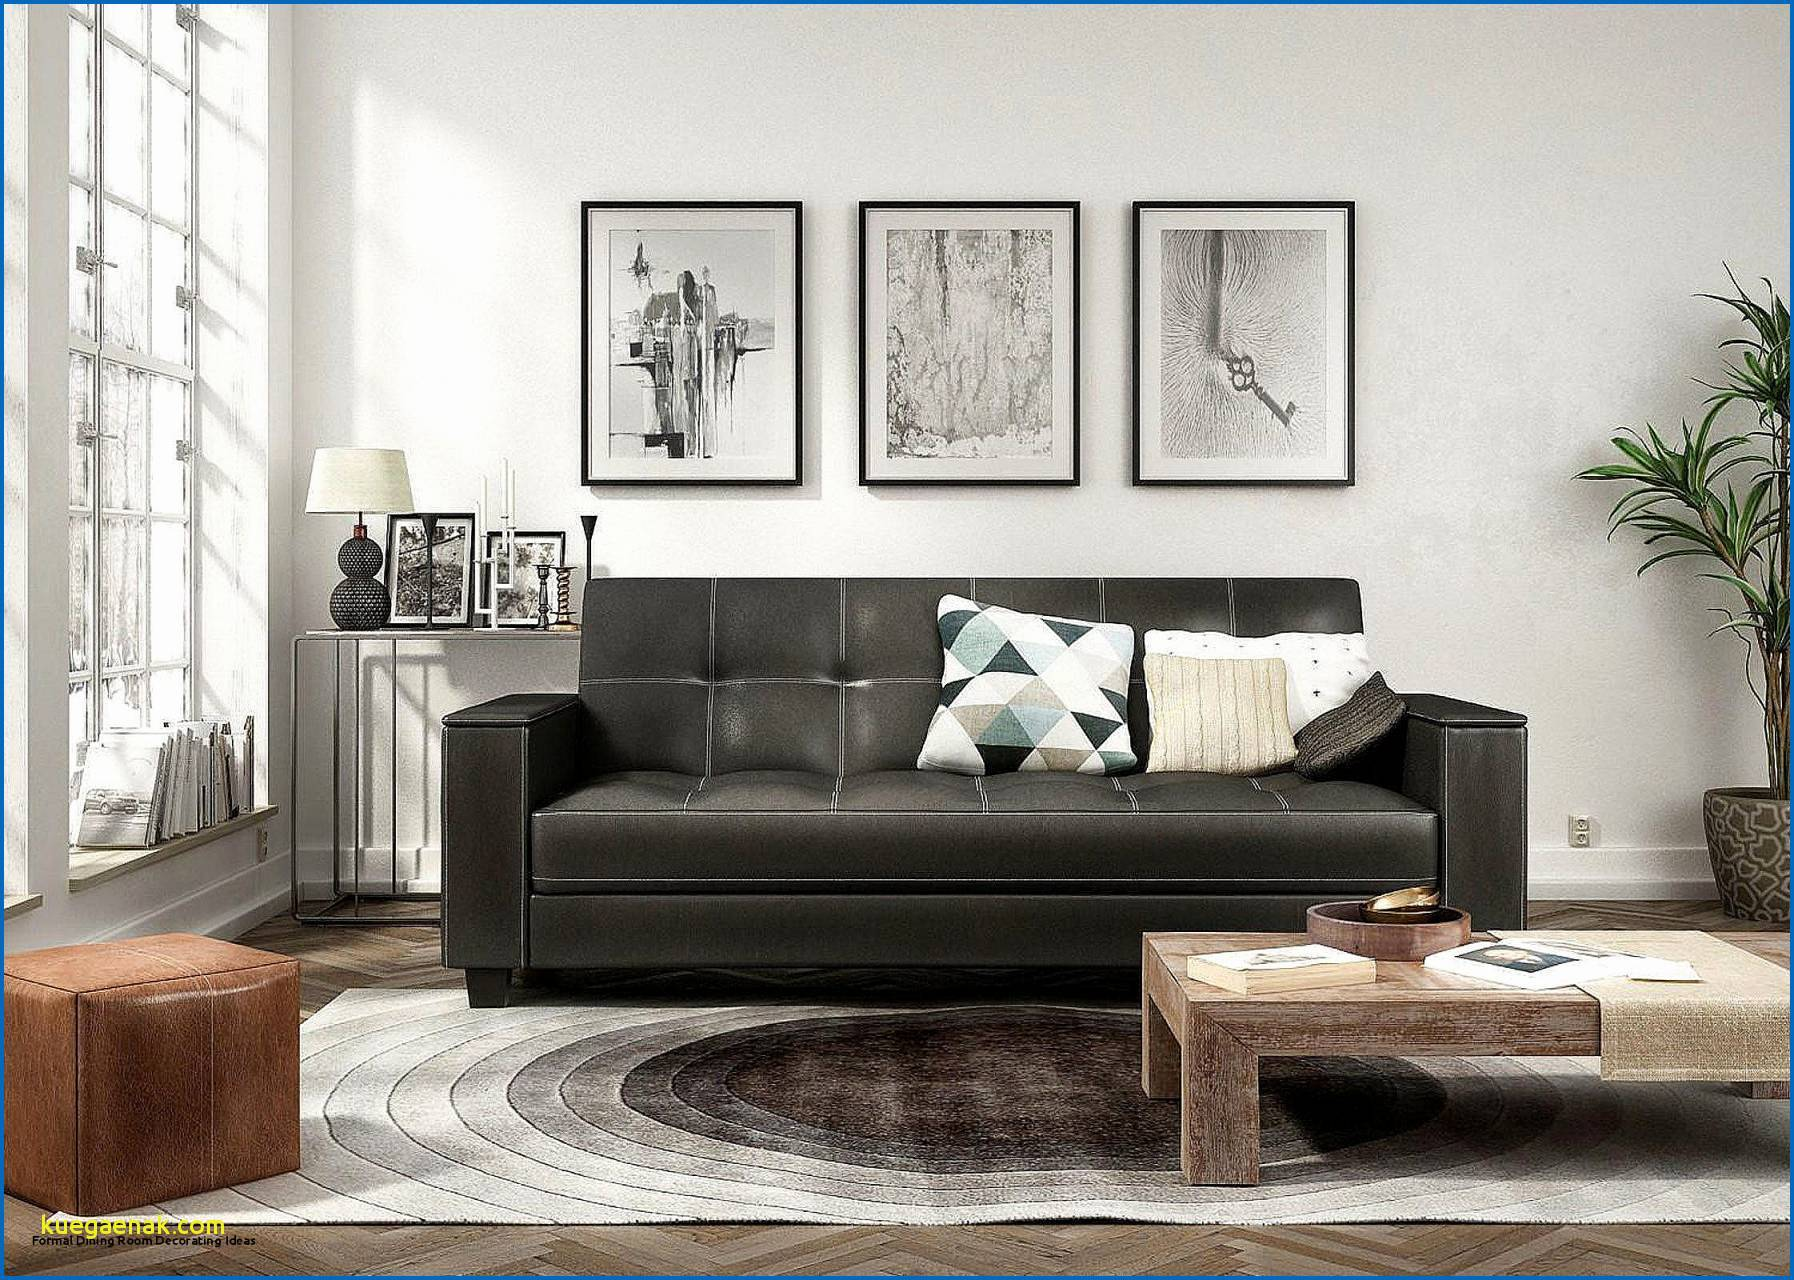 modern living dining room ideas luxury dining room furniture ideas best modern living room furniture new of modern living dining room ideas